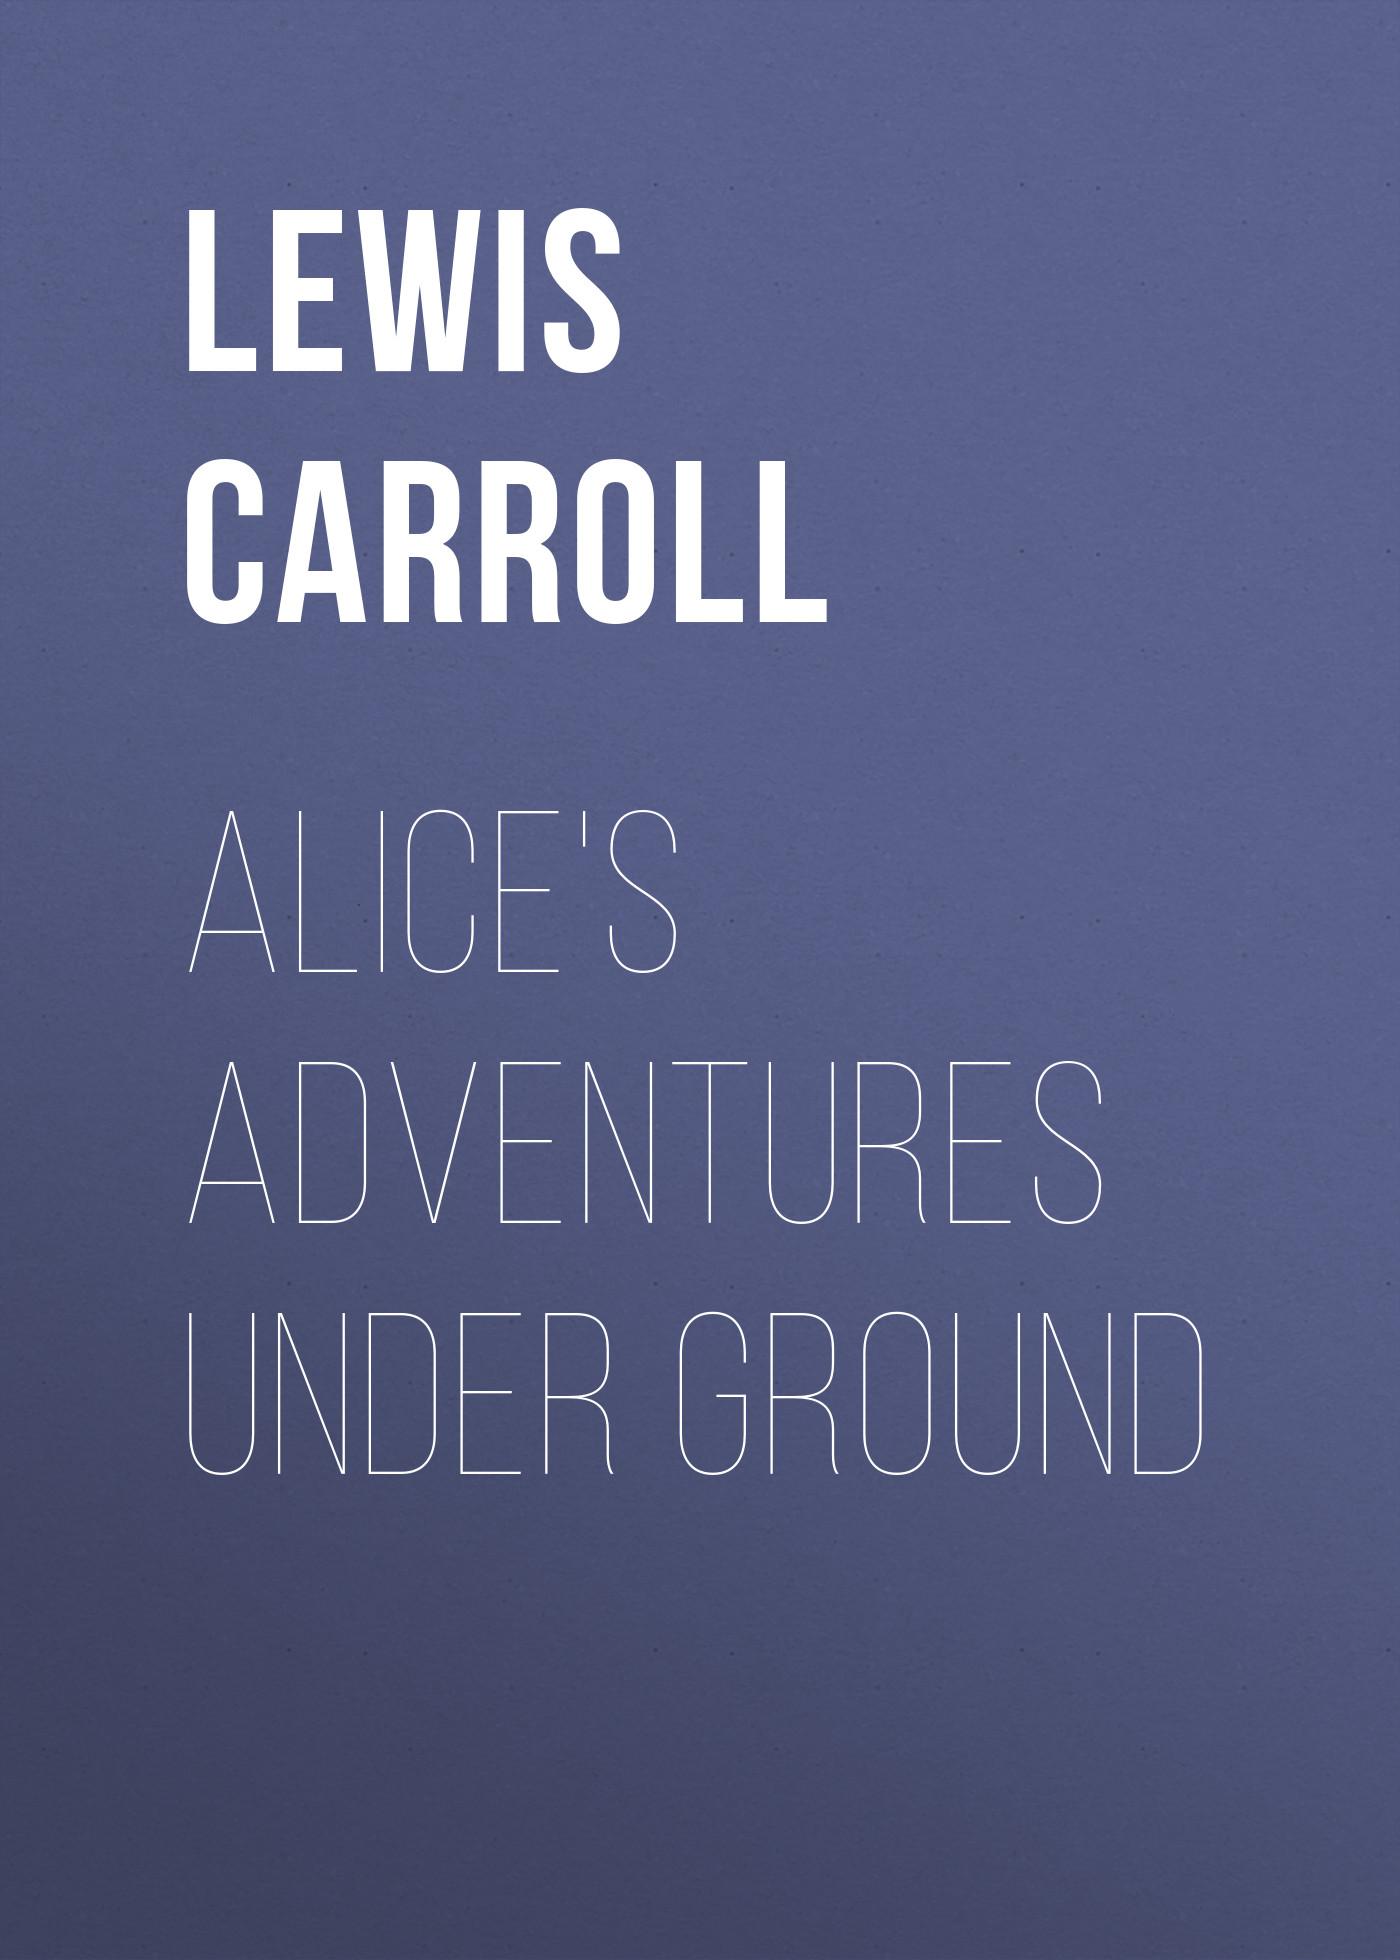 Льюис Кэрролл Alice's Adventures Under Ground whispers under ground